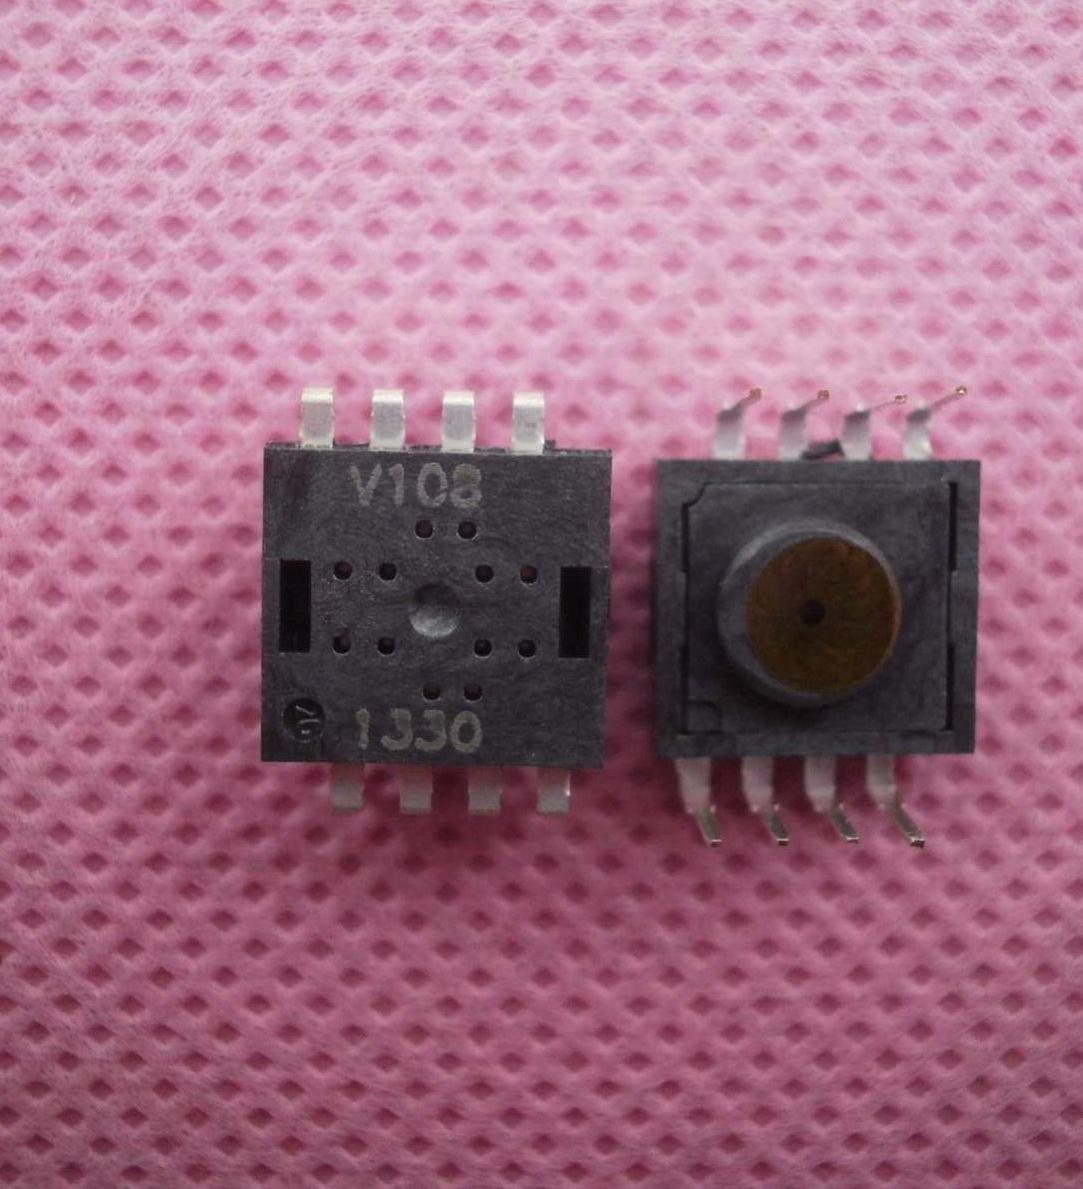 Wireless mouse IC Optical sensor V108 DIP8L 3-6 buttons CPI 400/ 500/ 600/ 800/ 1000(Default)/ 1200 / 1600